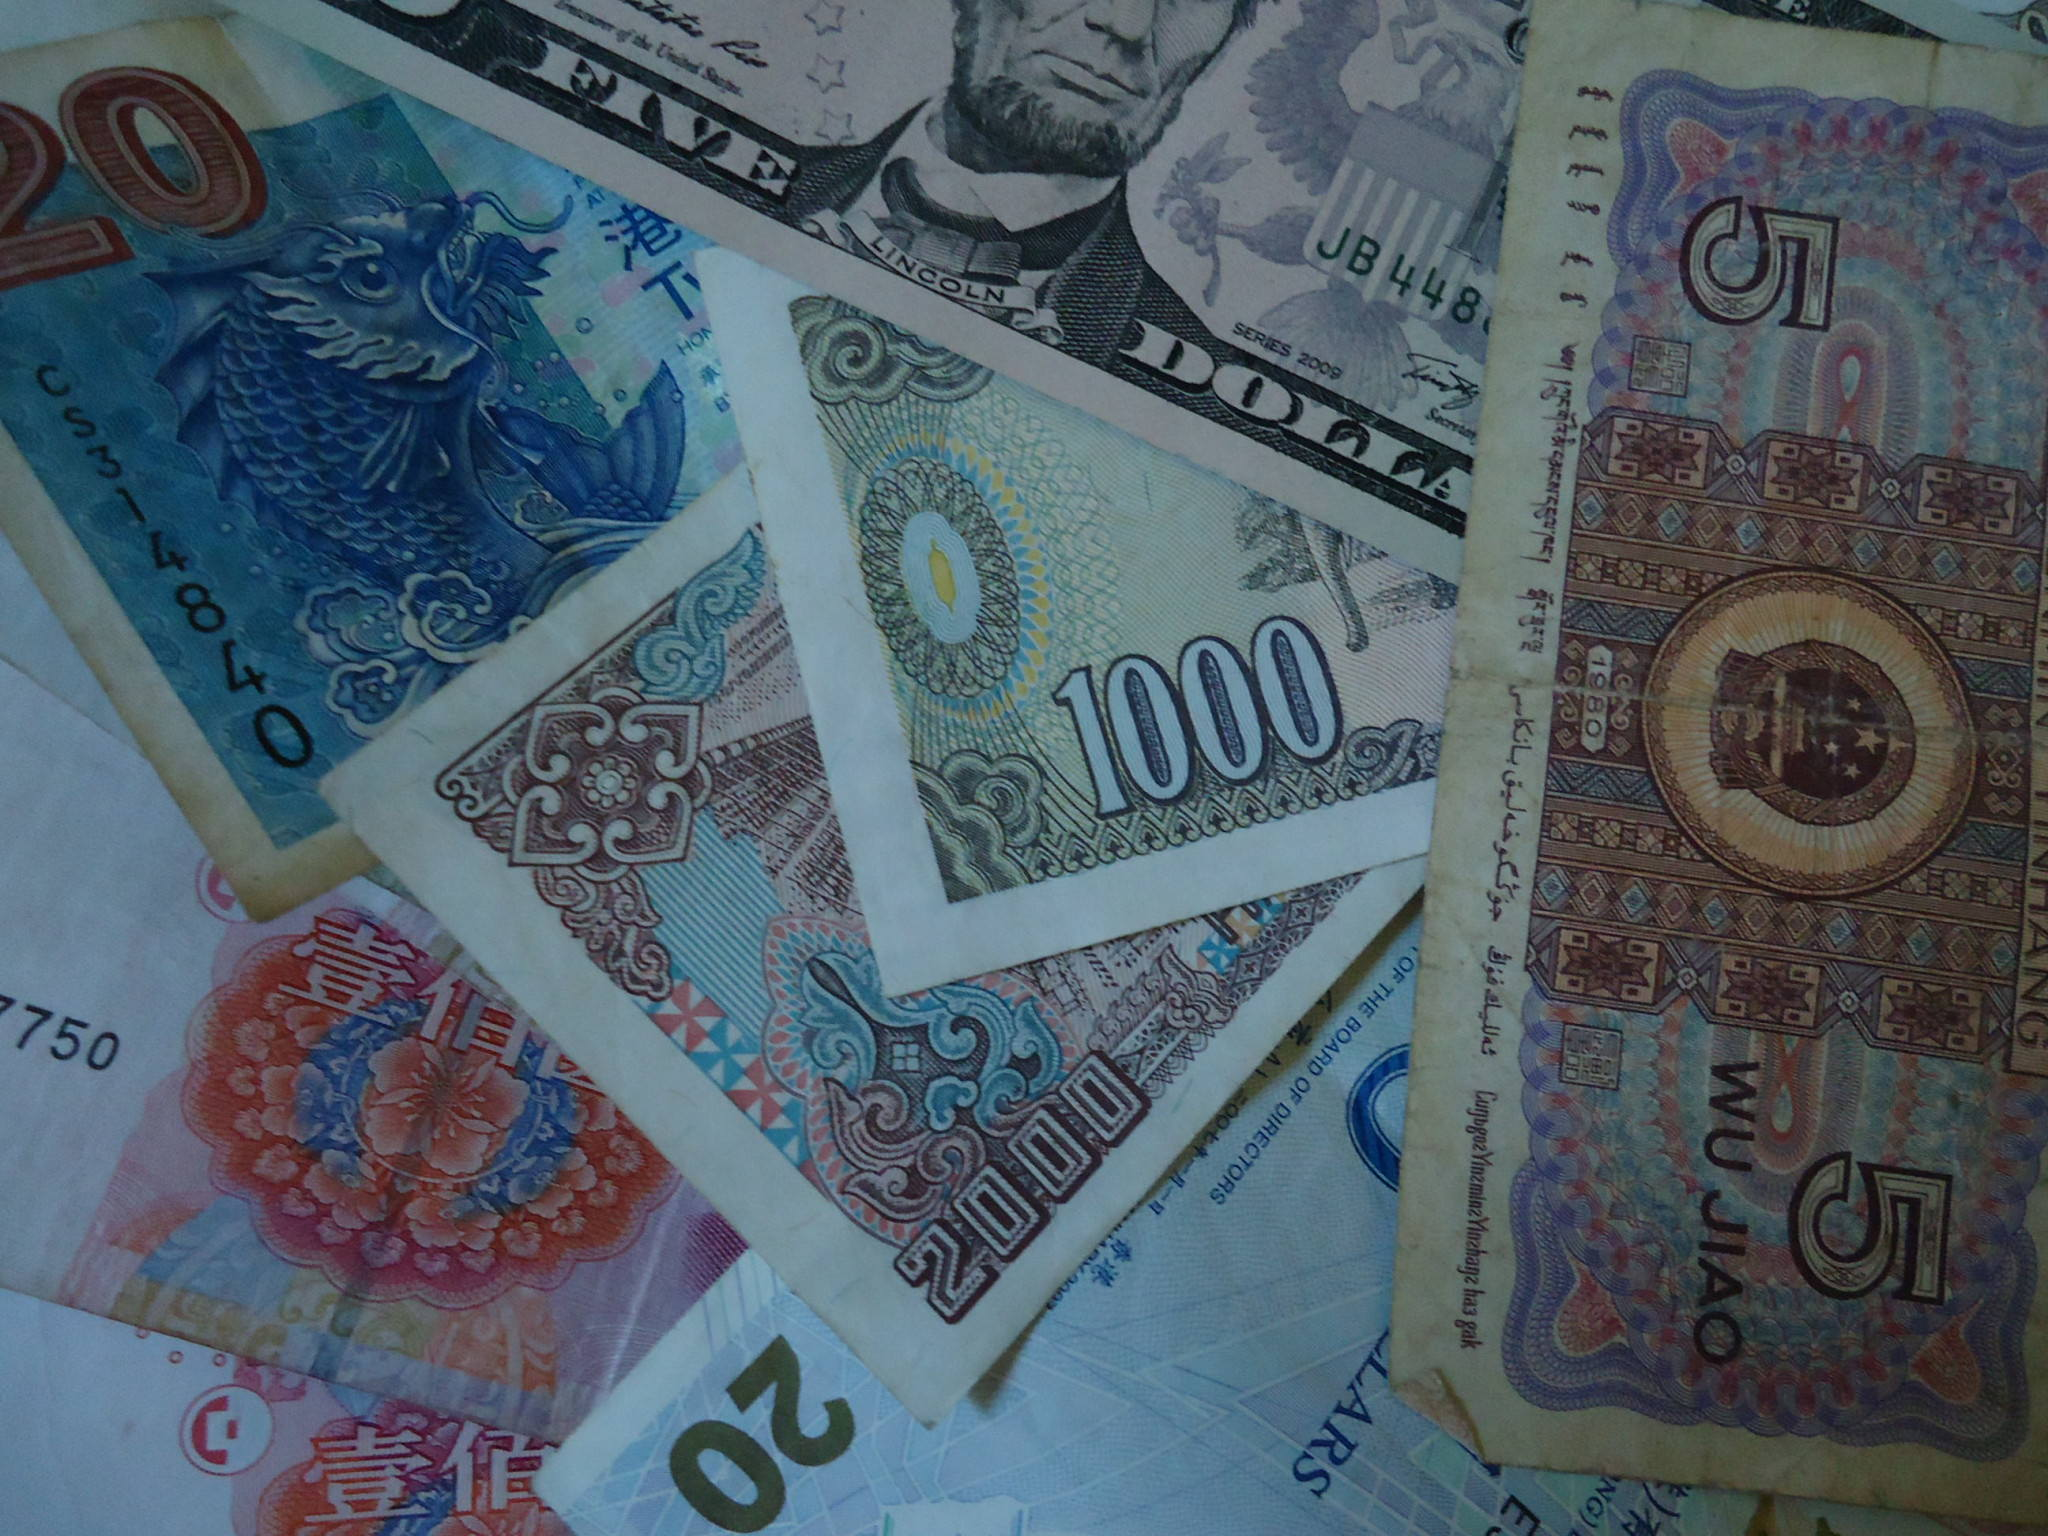 banknotes by jonny blair